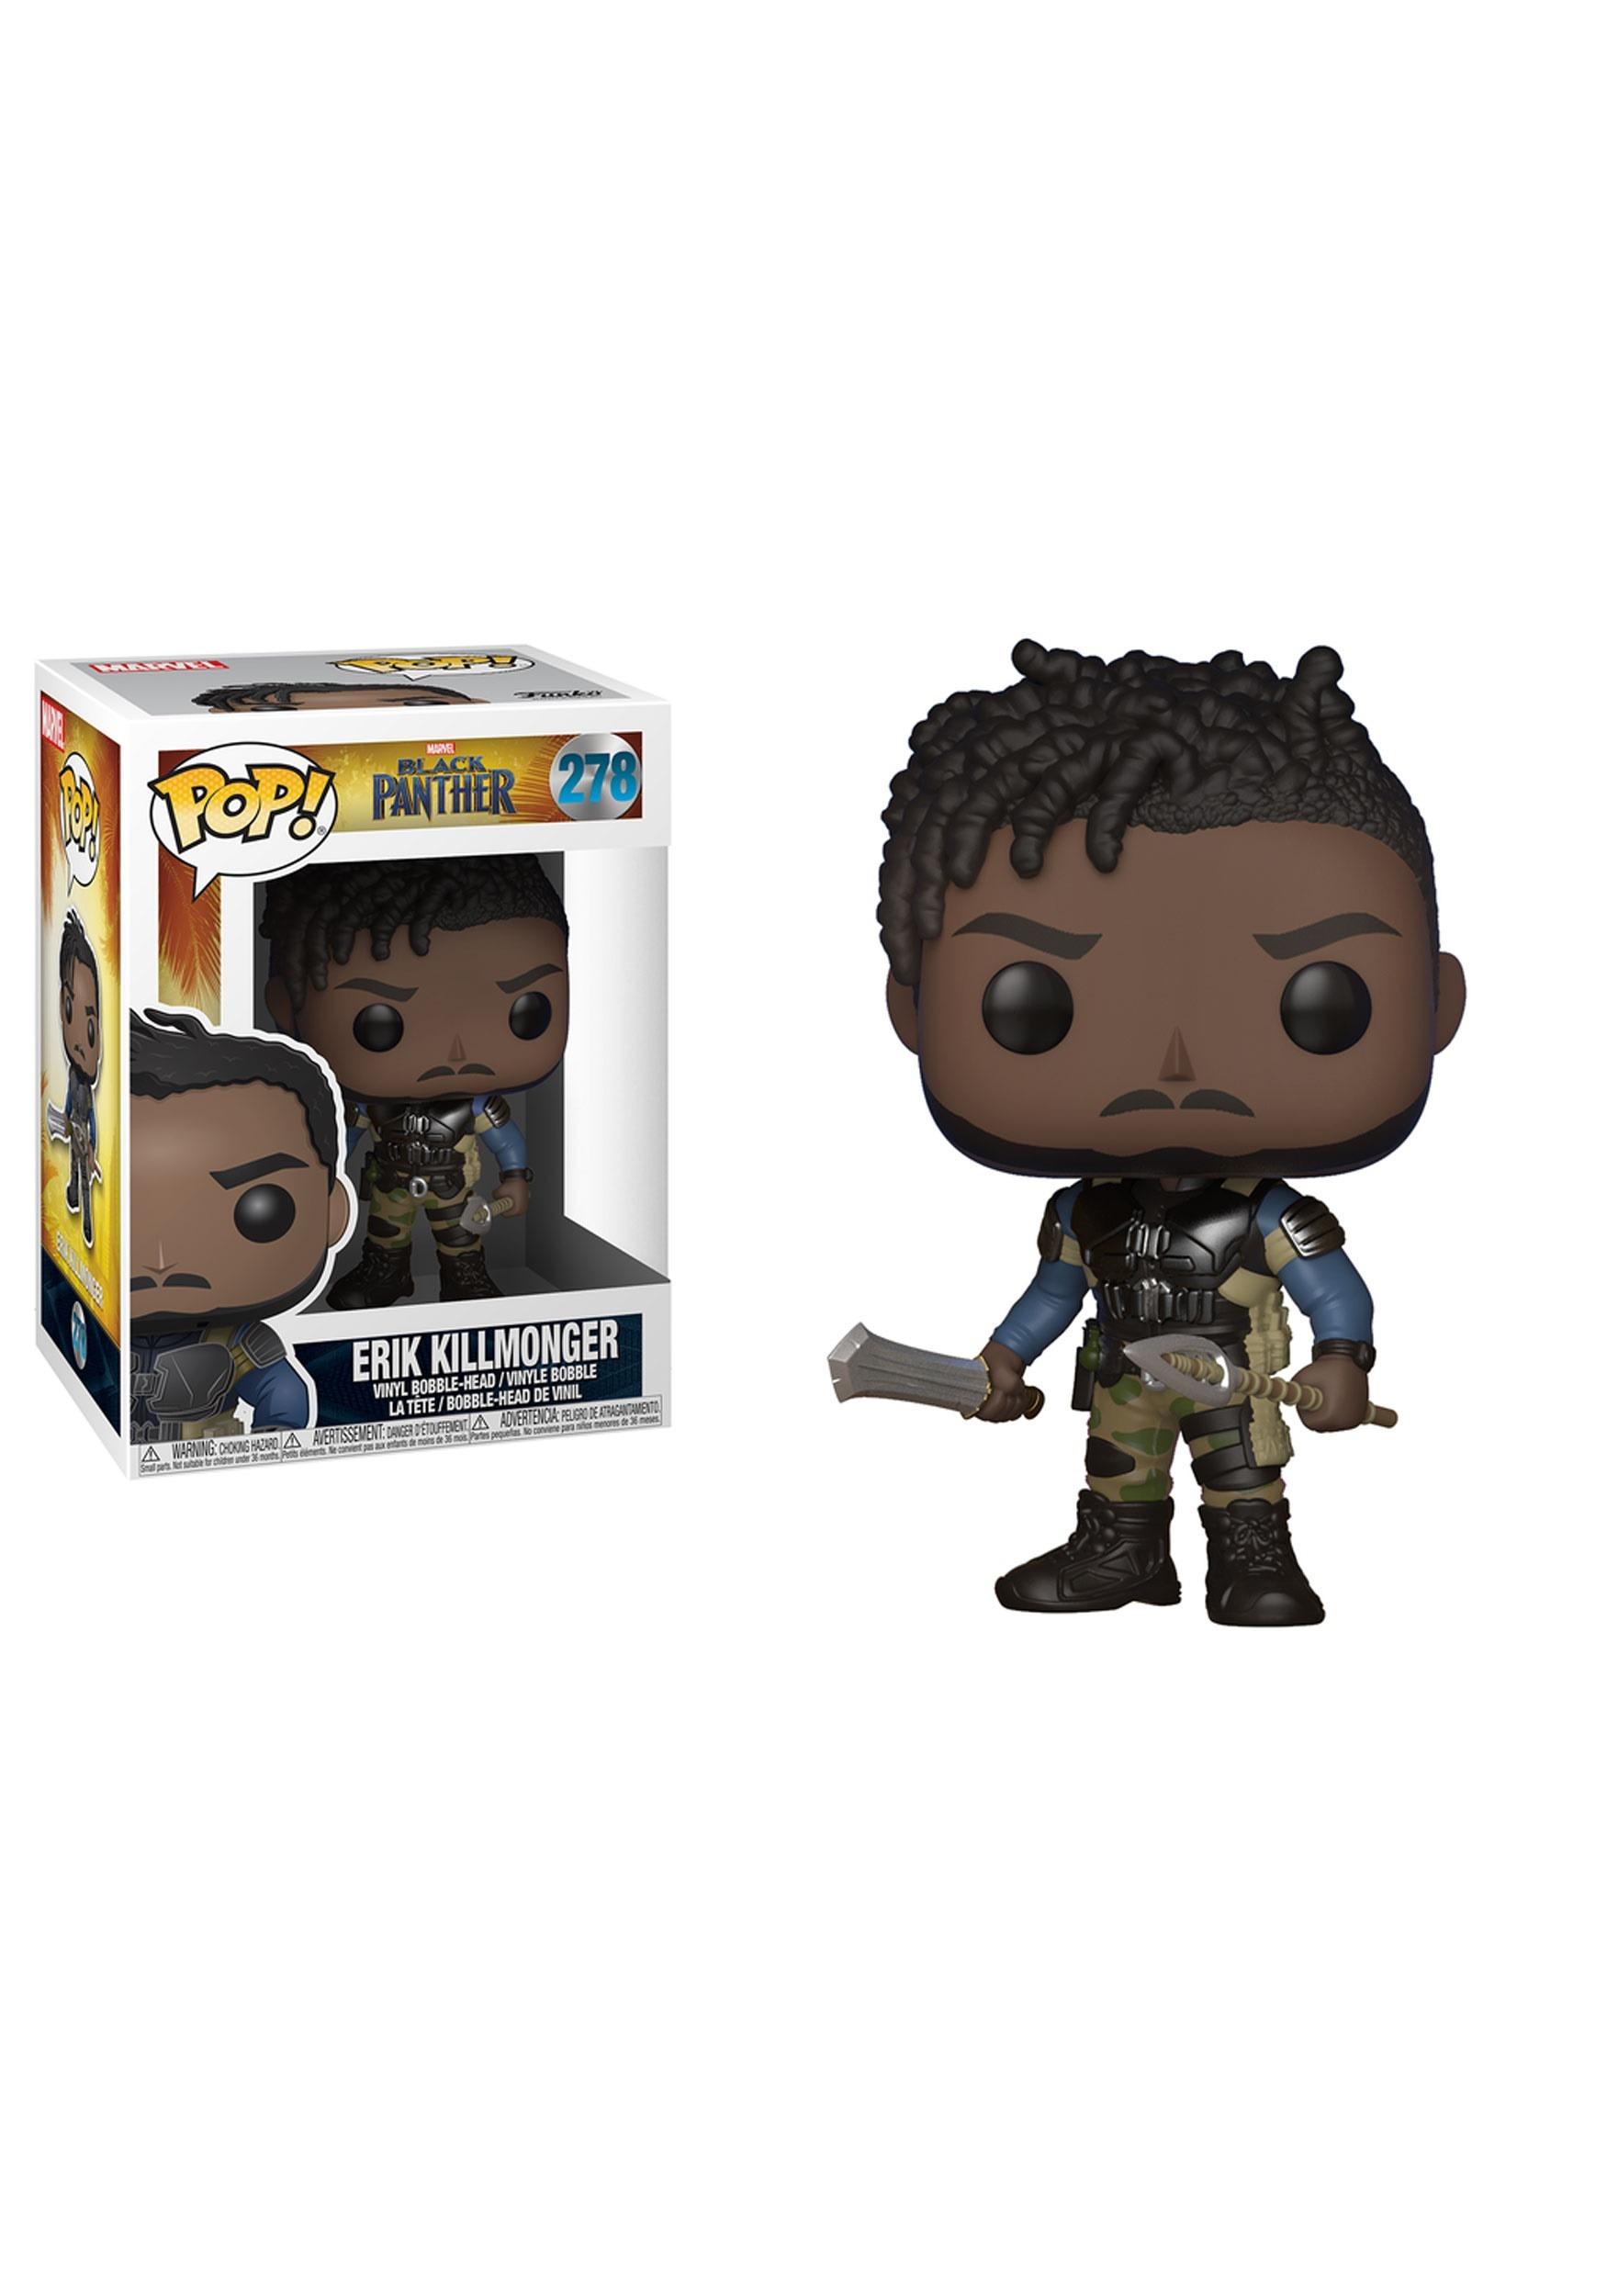 Pop! Marvel: Black Panther - Erik Killmonger FN23350